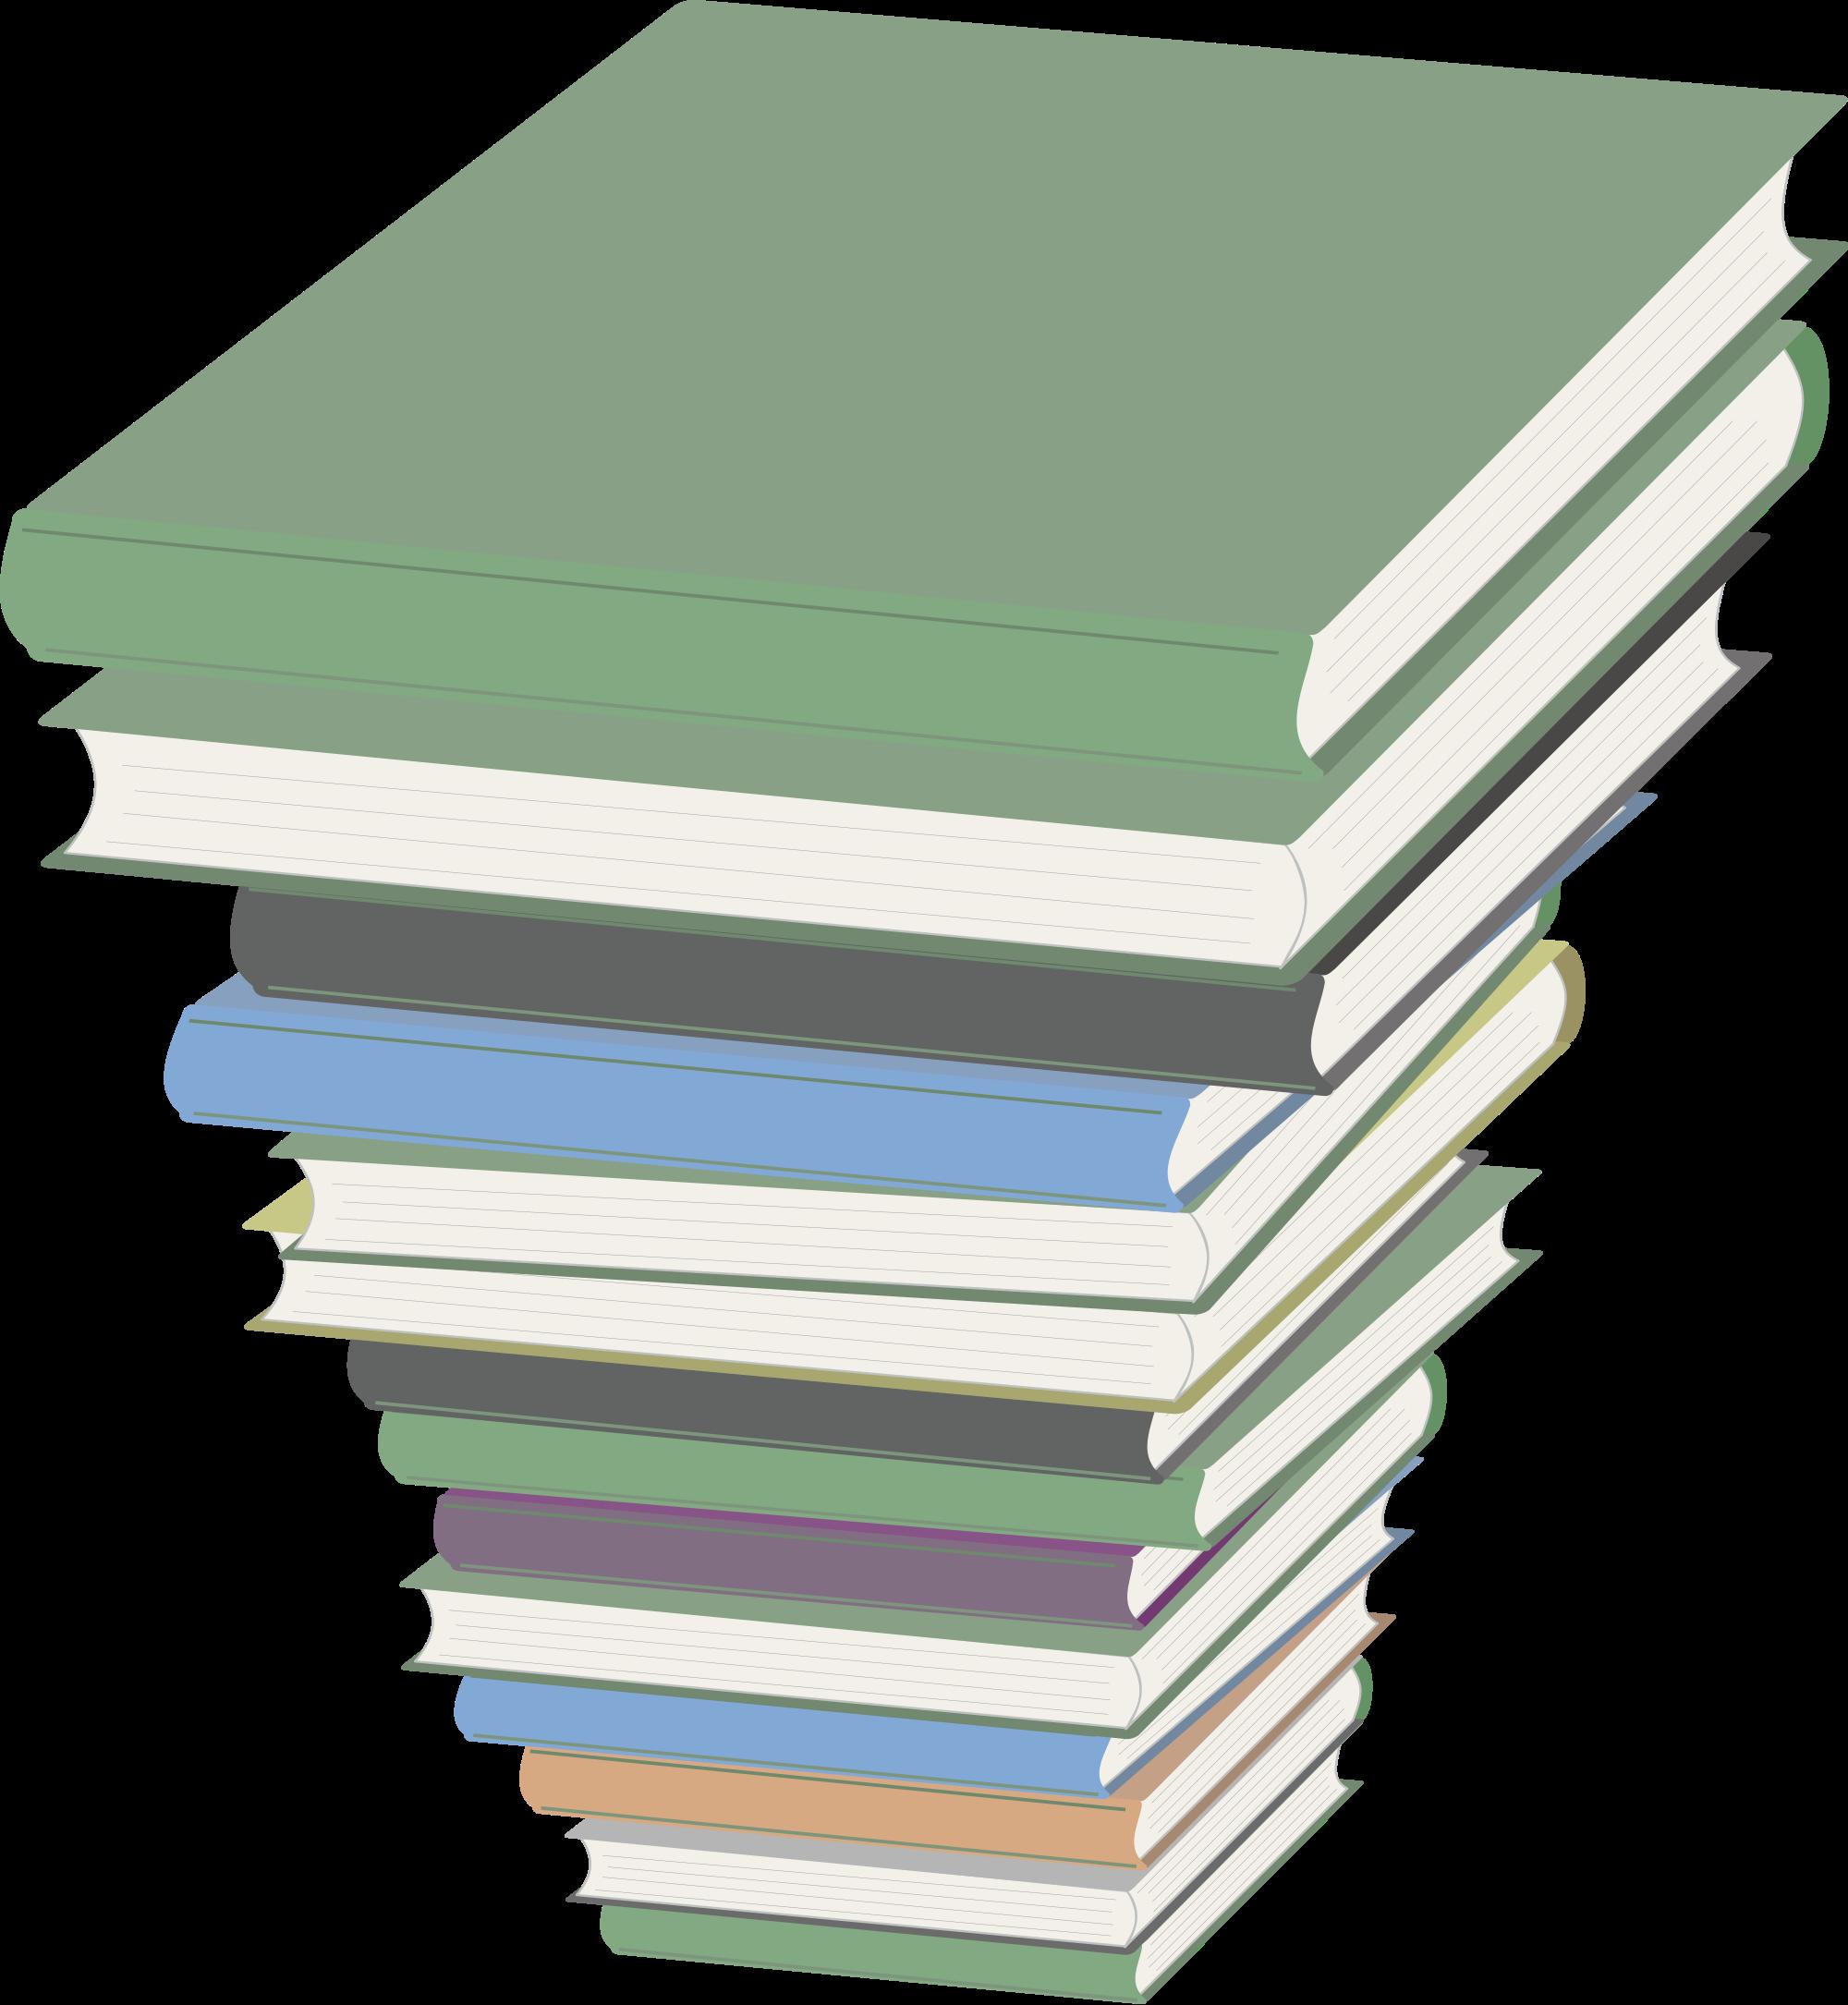 Book svg #1, Download drawings